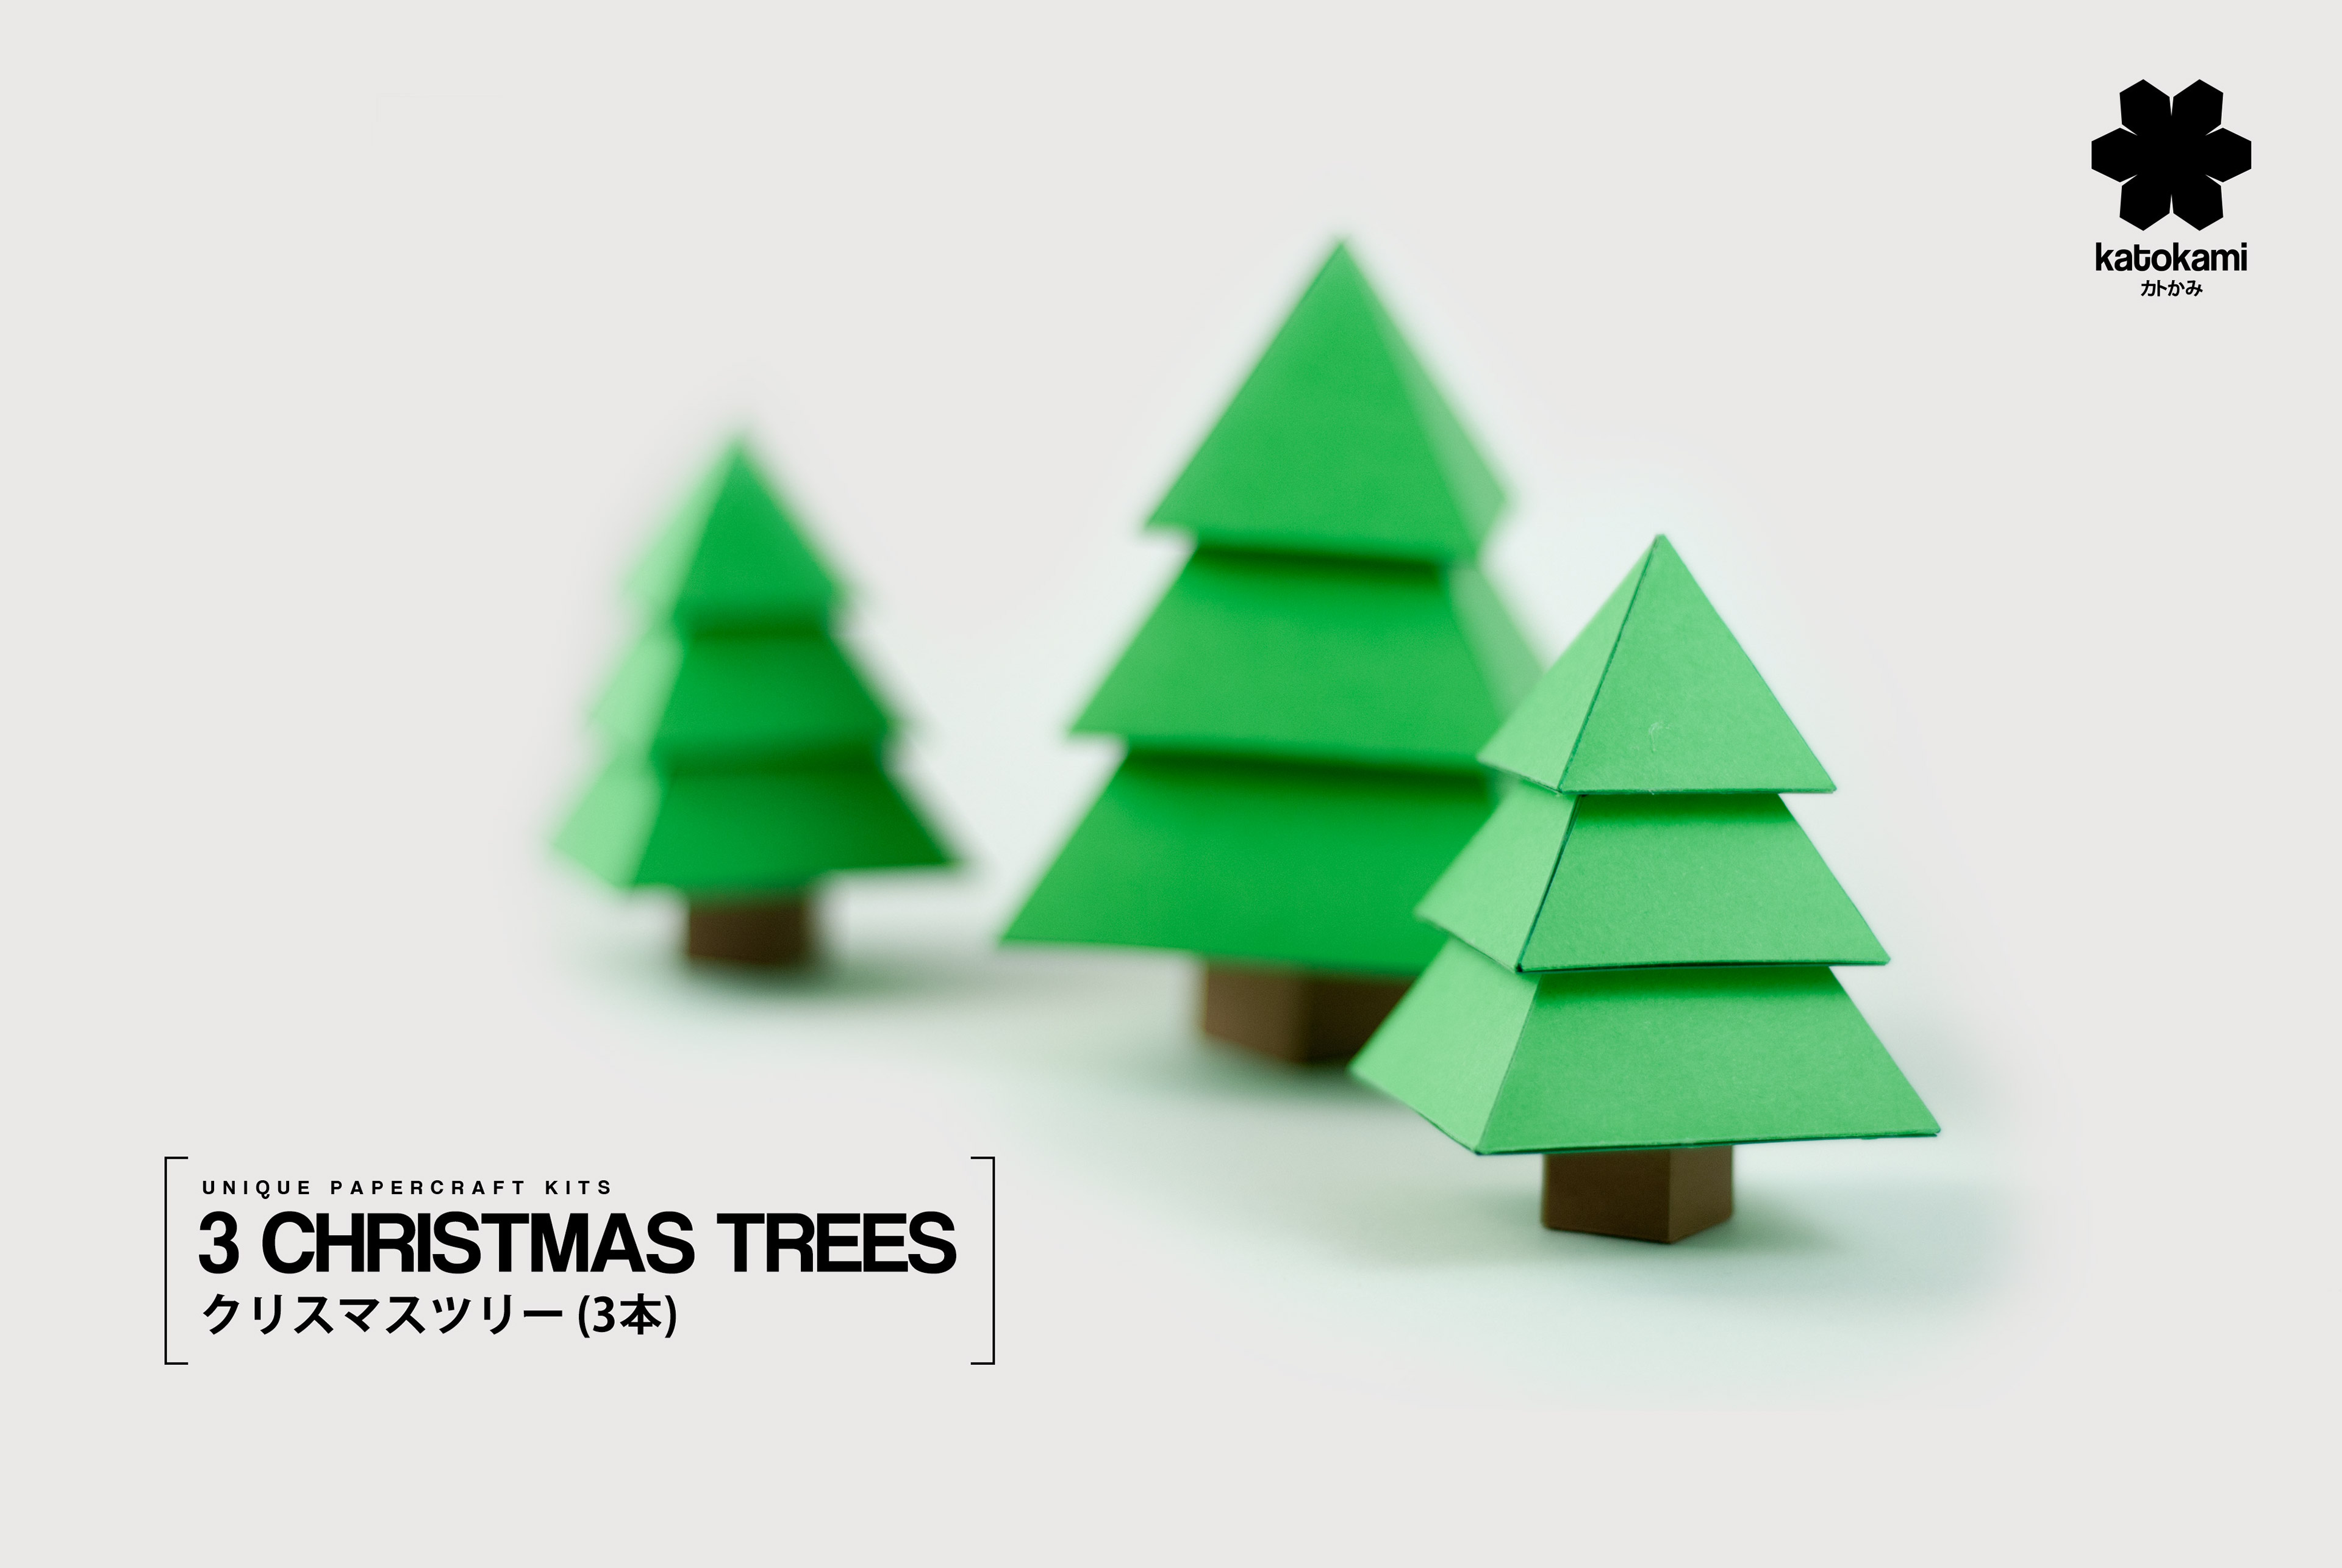 Christmas Trees by Katokami - DIY Papercraft Kits on Behance